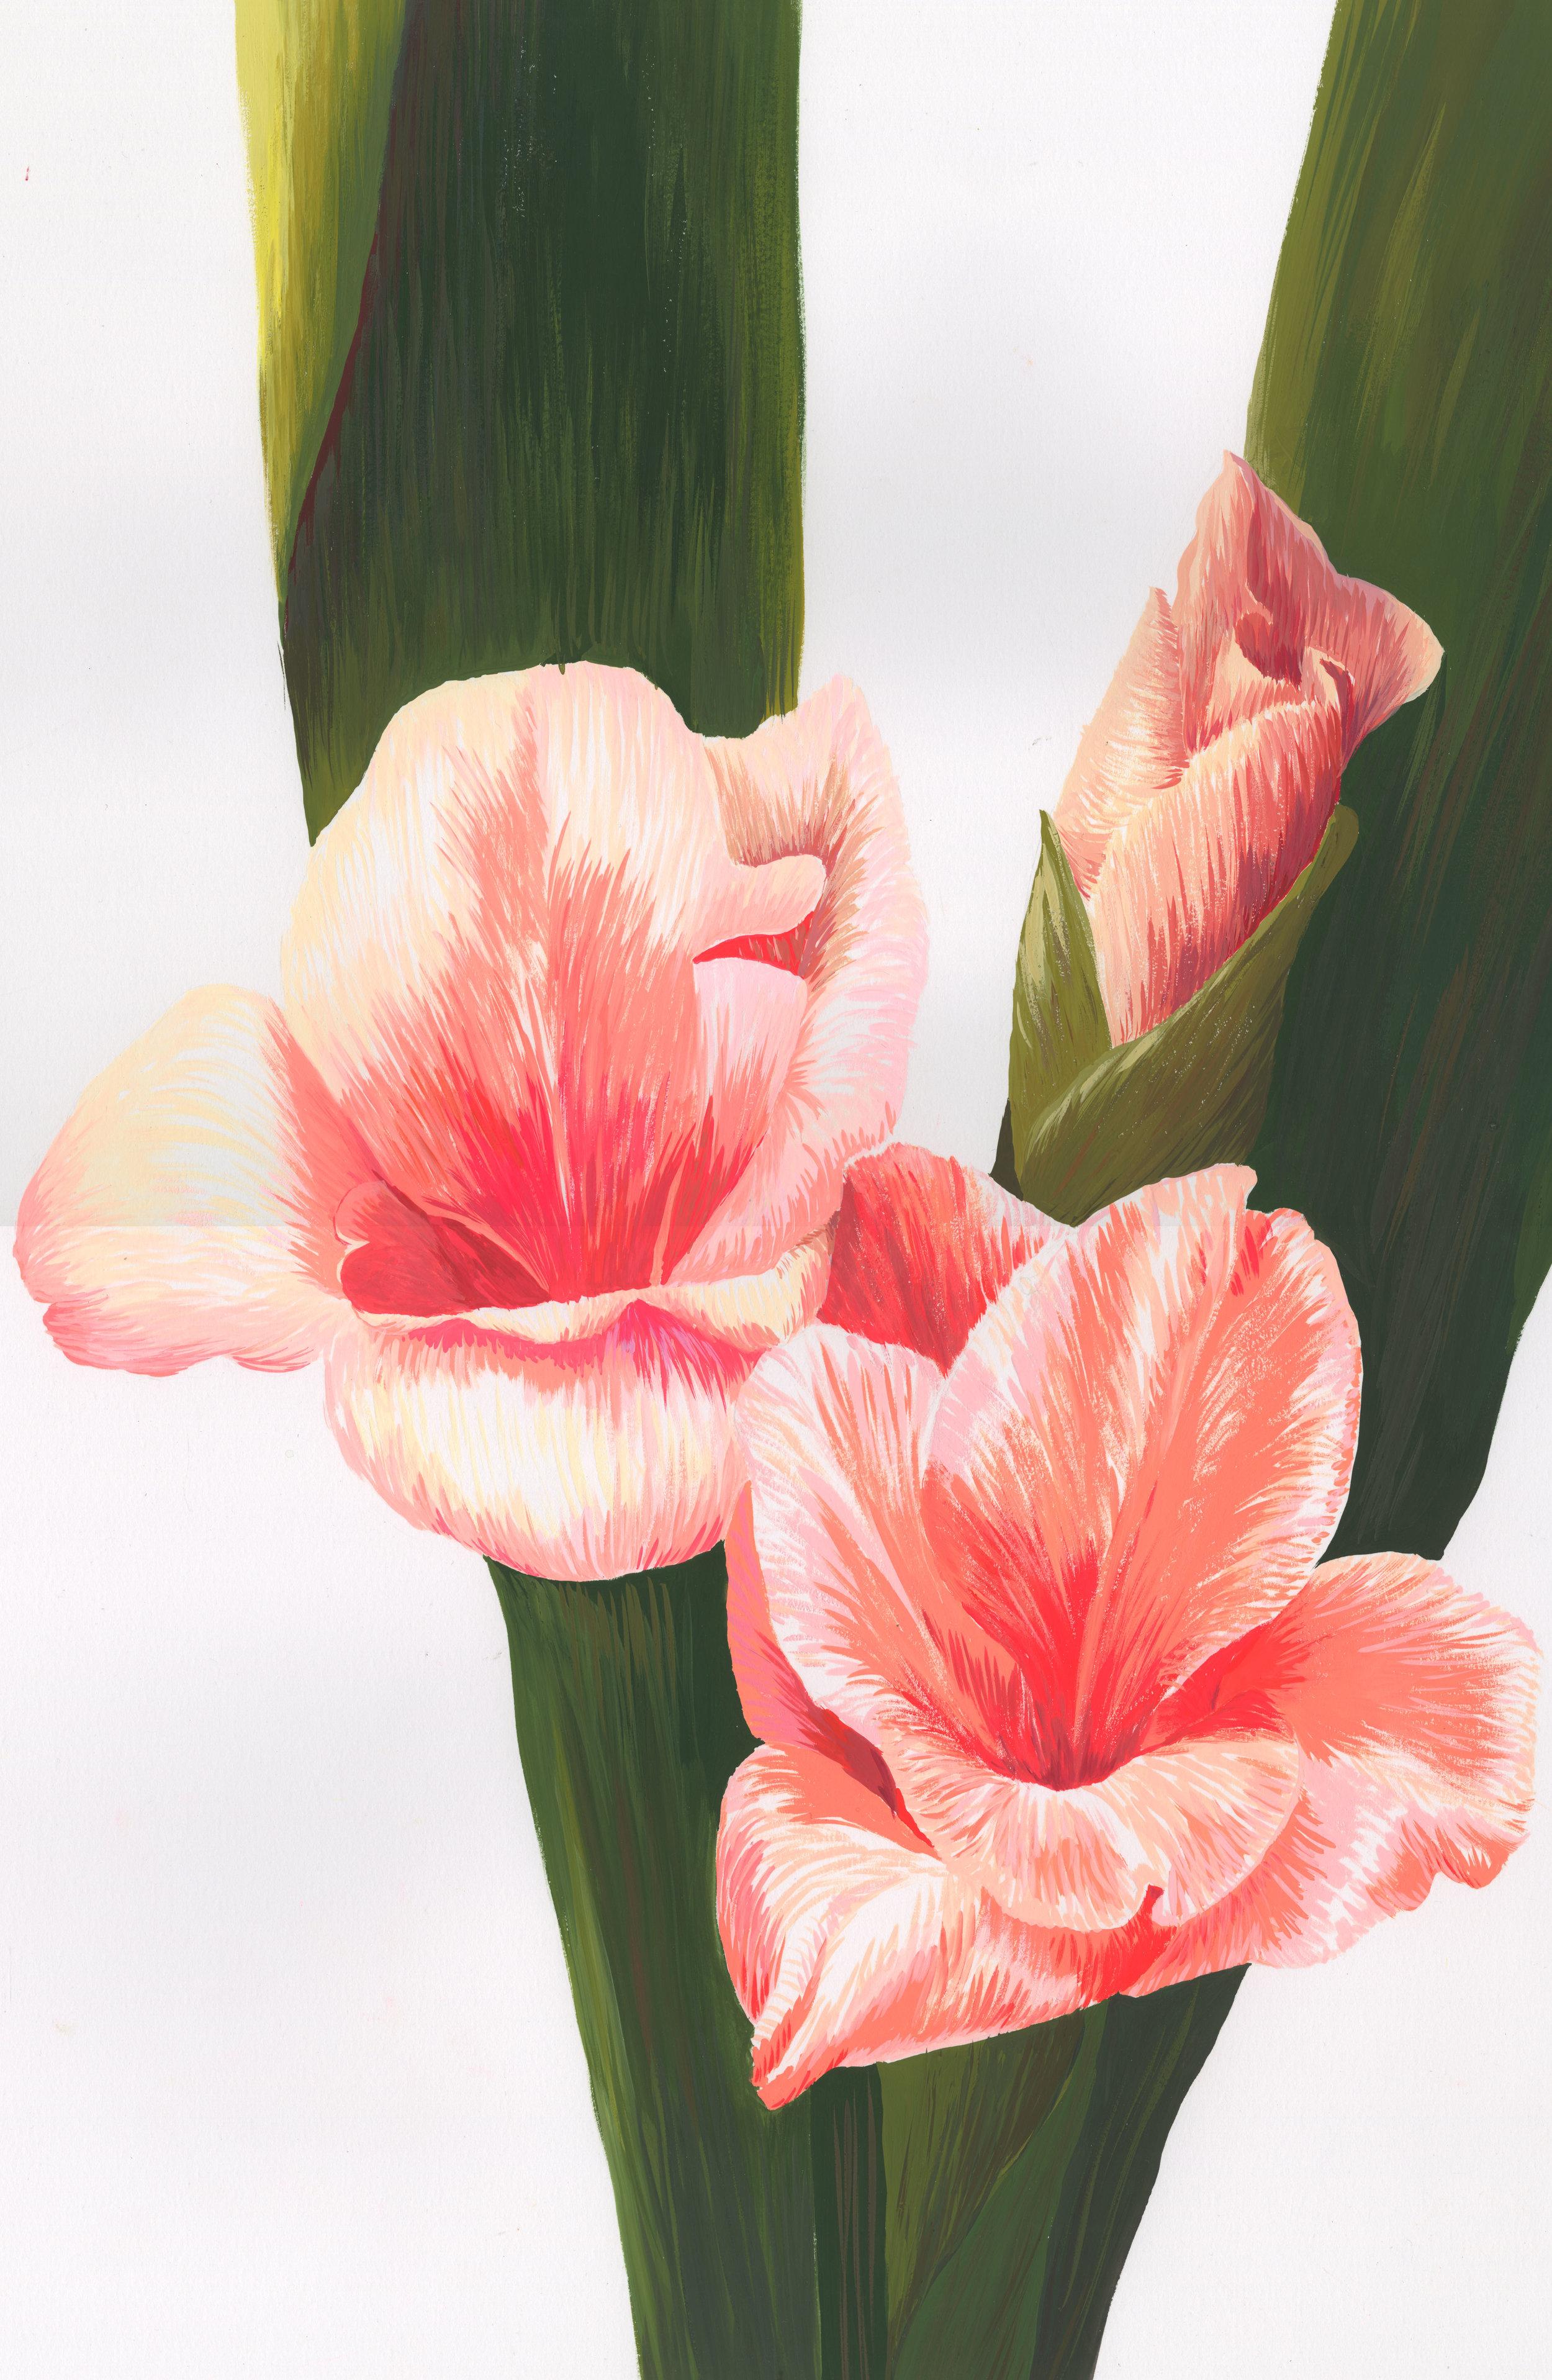 Gladiola Nature Study